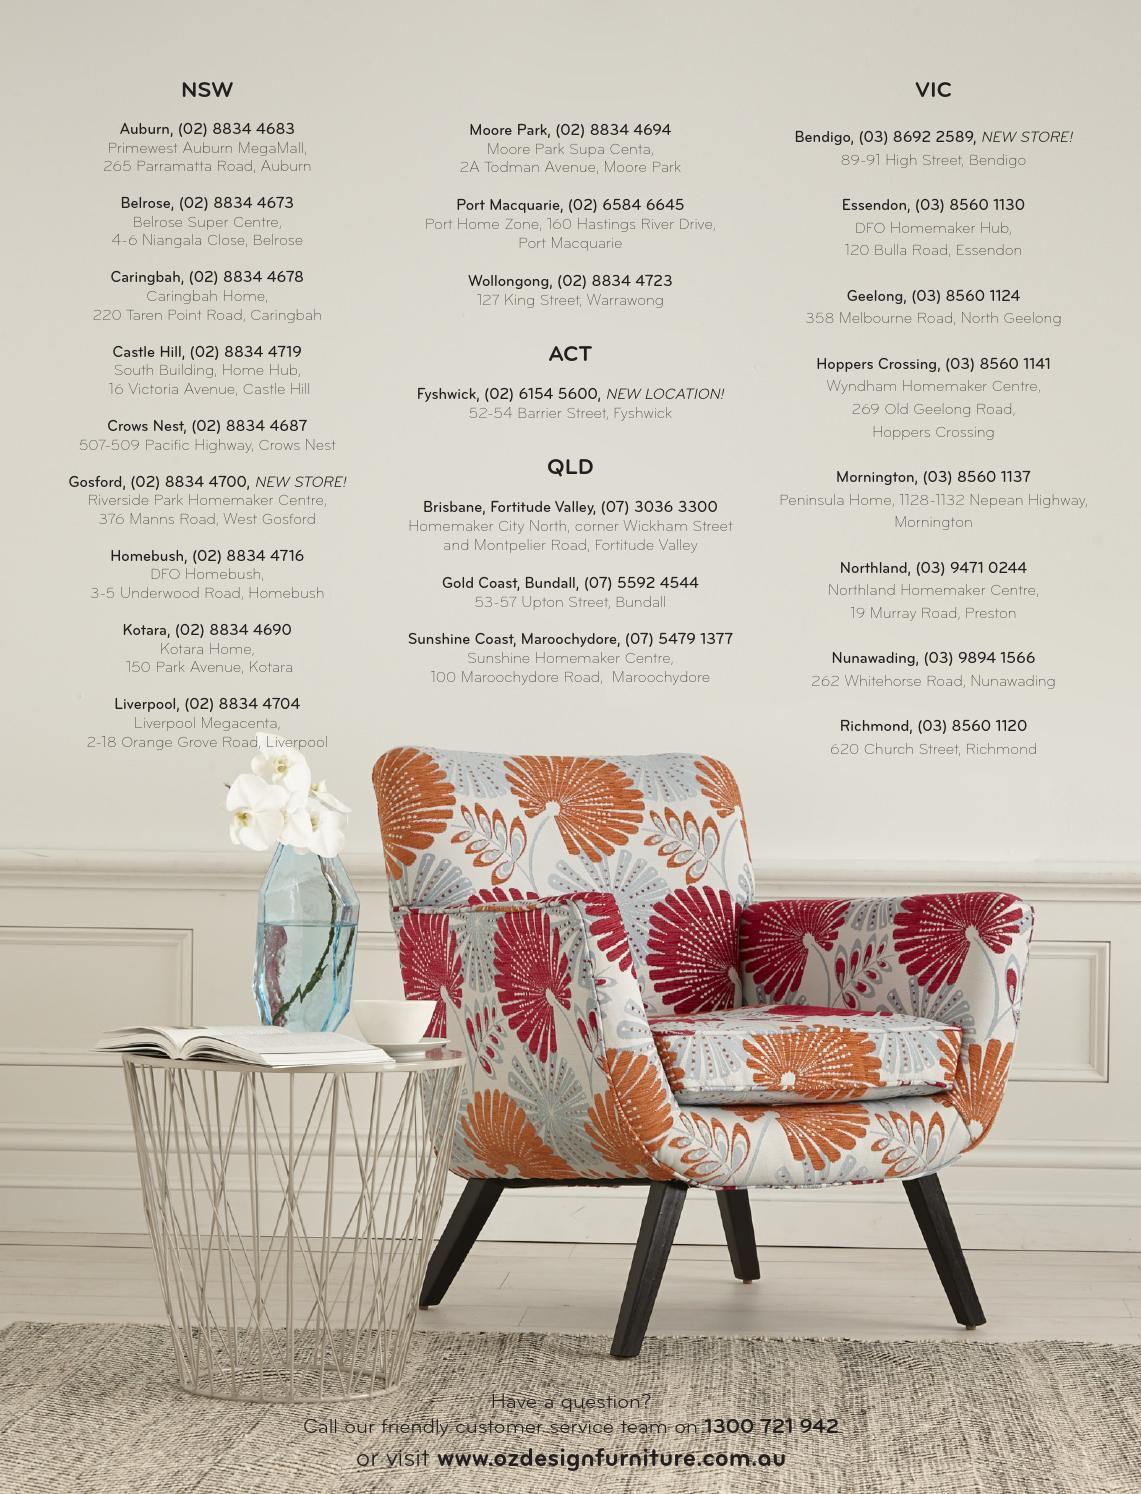 Oz design furniture summer 15 16 directory